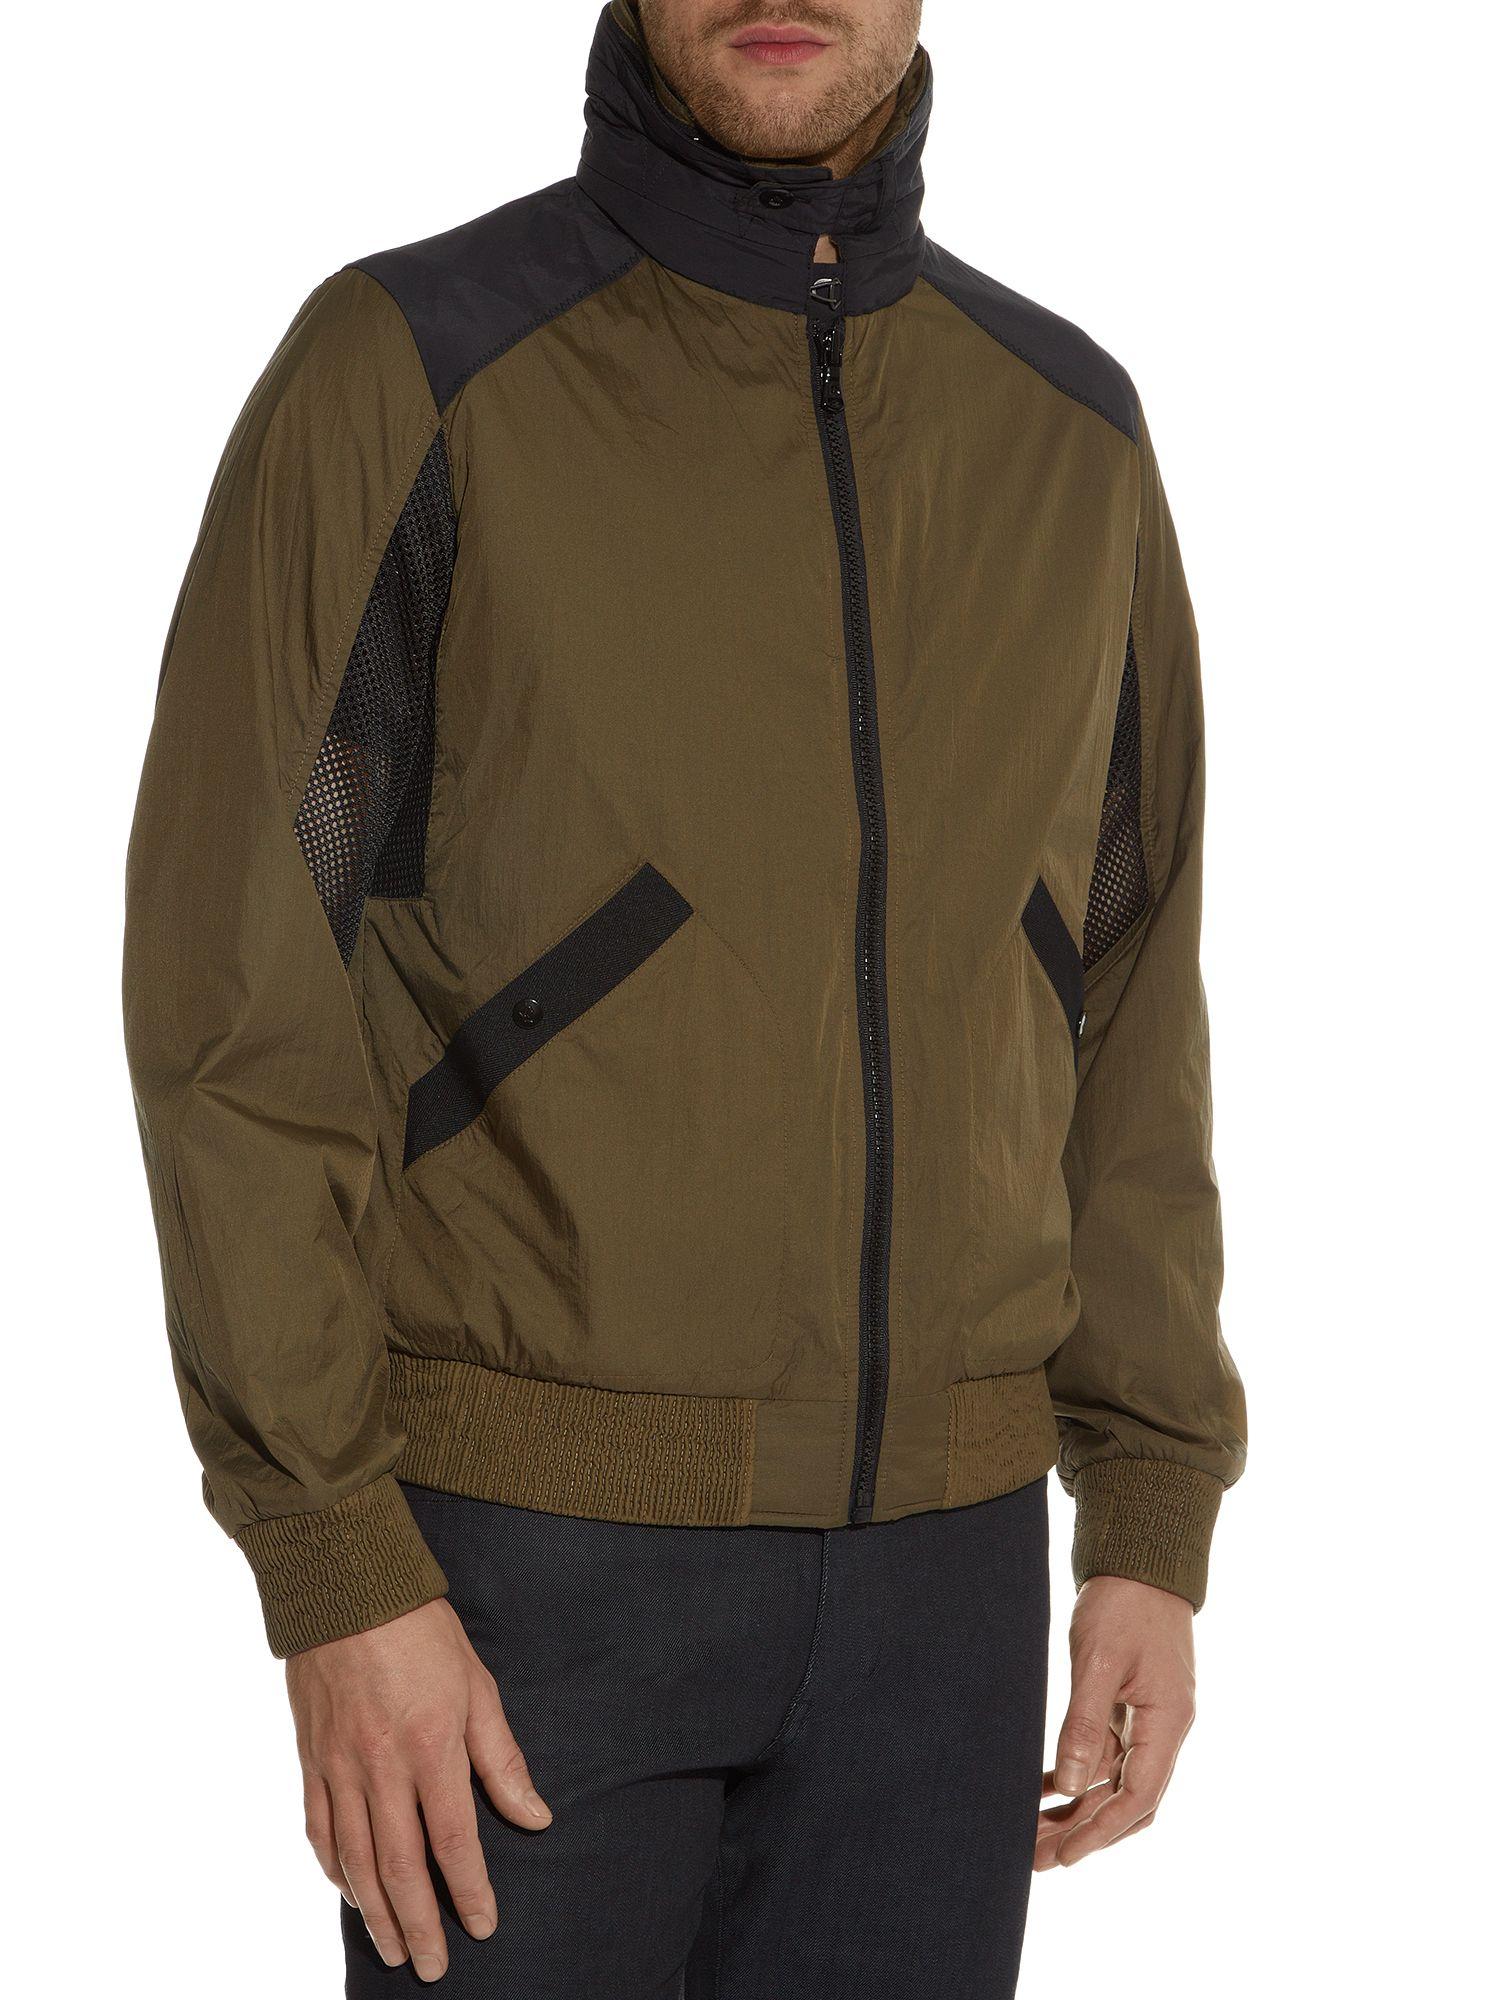 Victorinox Aerostat Jacket in Army (Green) for Men